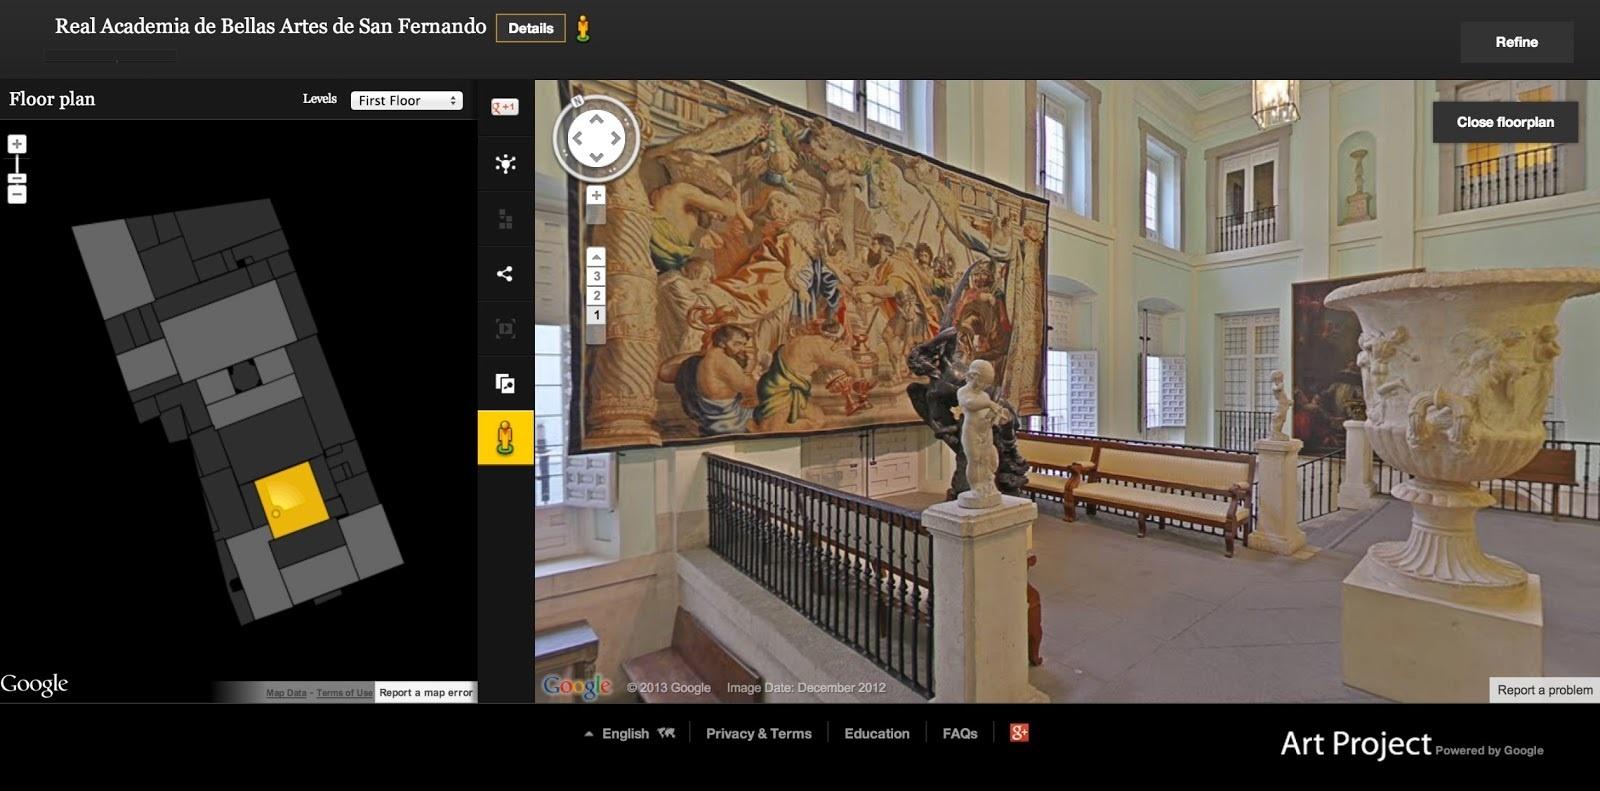 Ocho instituciones españolas se unen al Google Art Project